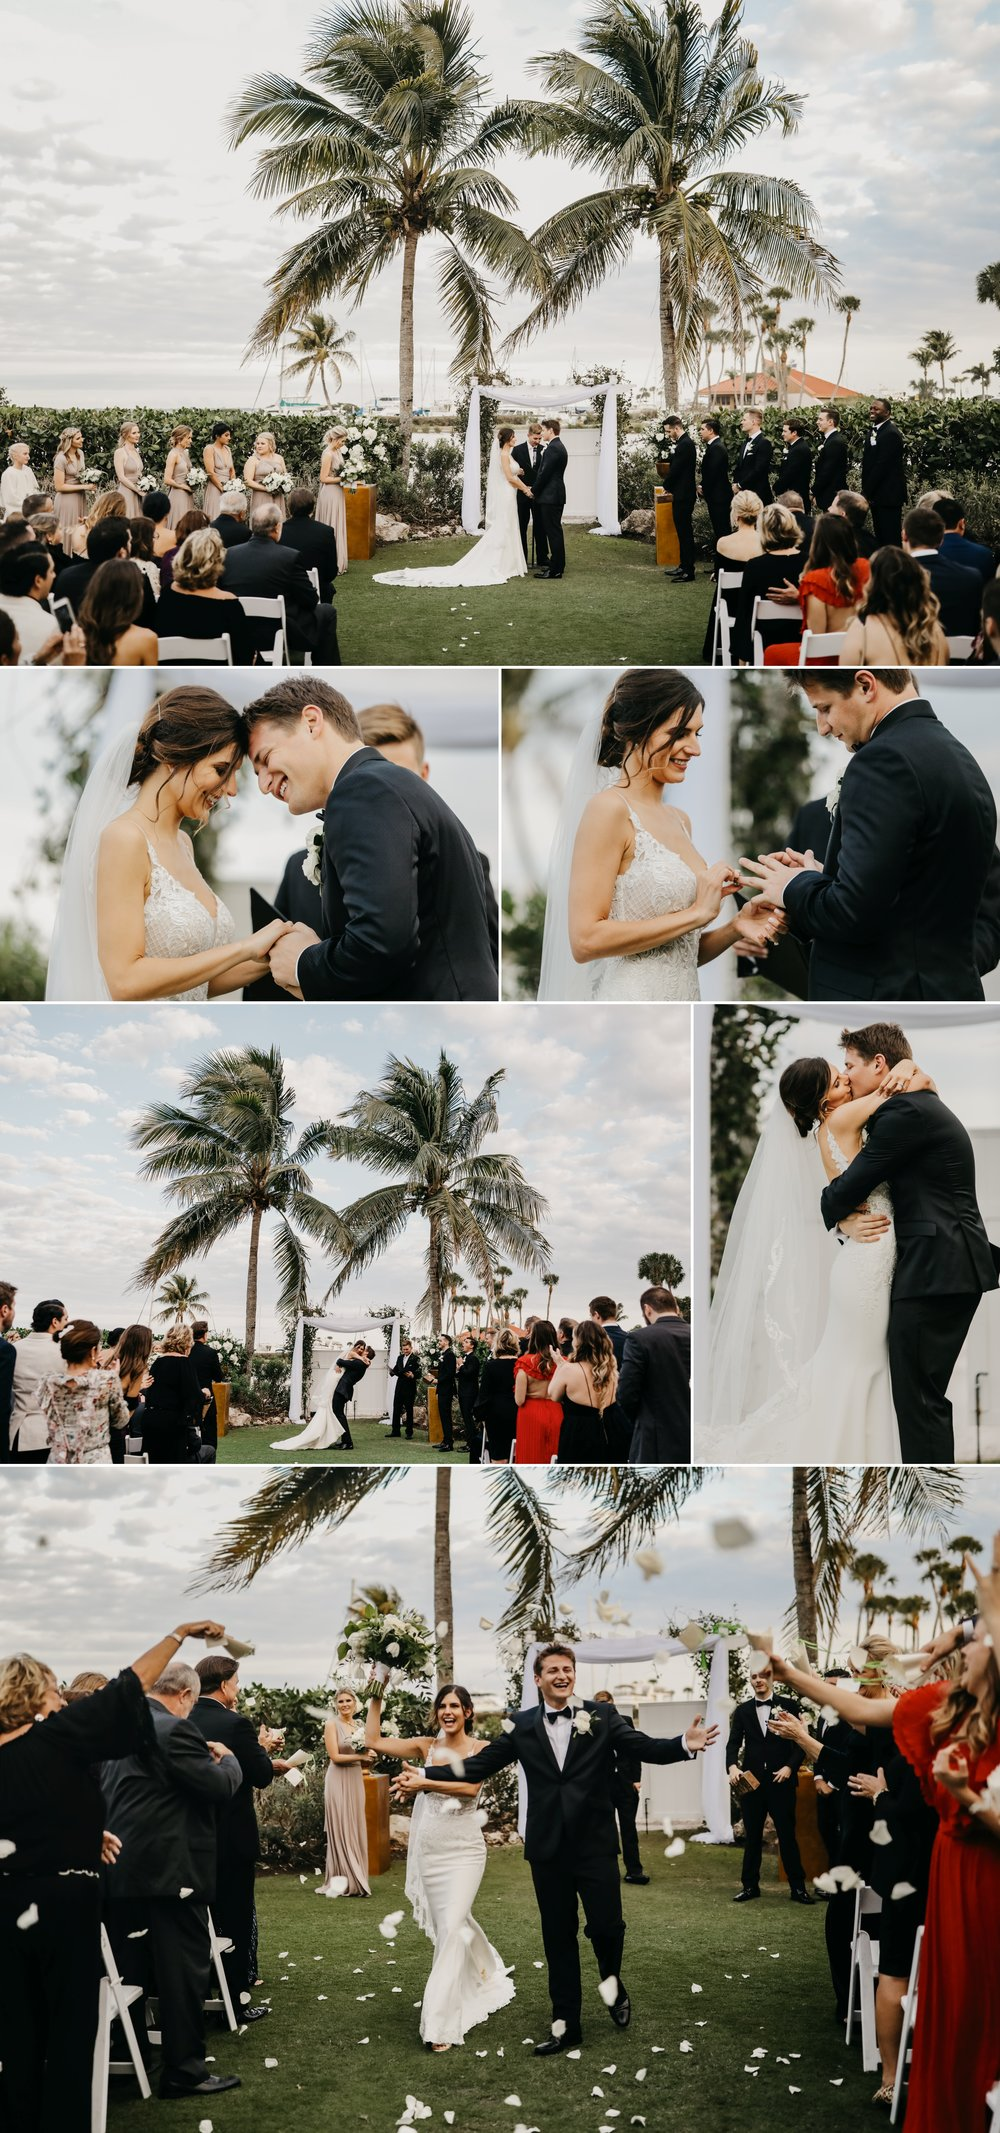 Luxe_tropical_travel_destination_wedding_photography_ShainaDeCiryan.com17.jpg